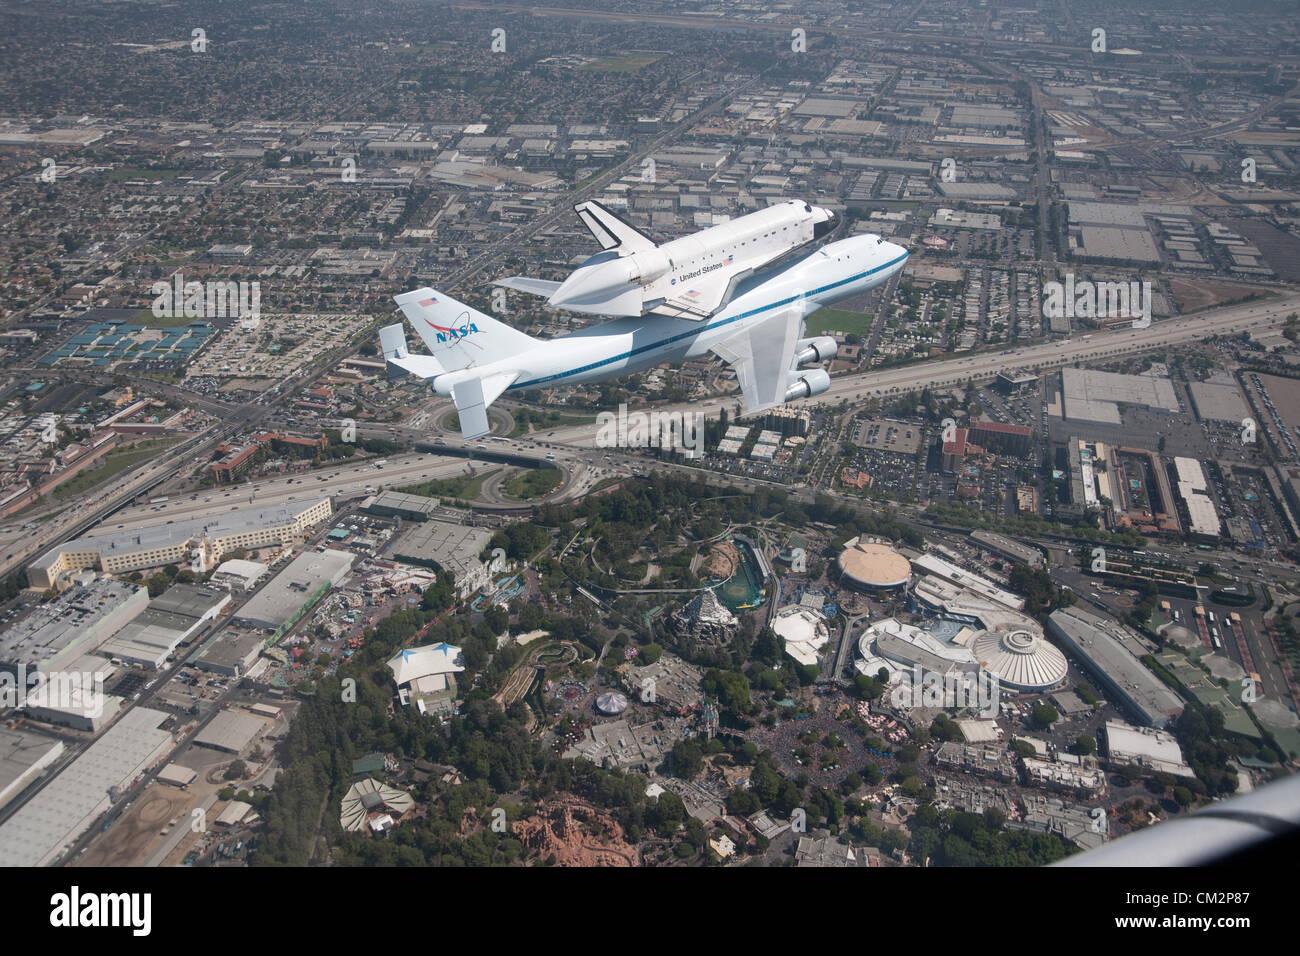 NASA Shuttle Carrier Aircraft carrying space shuttle ...